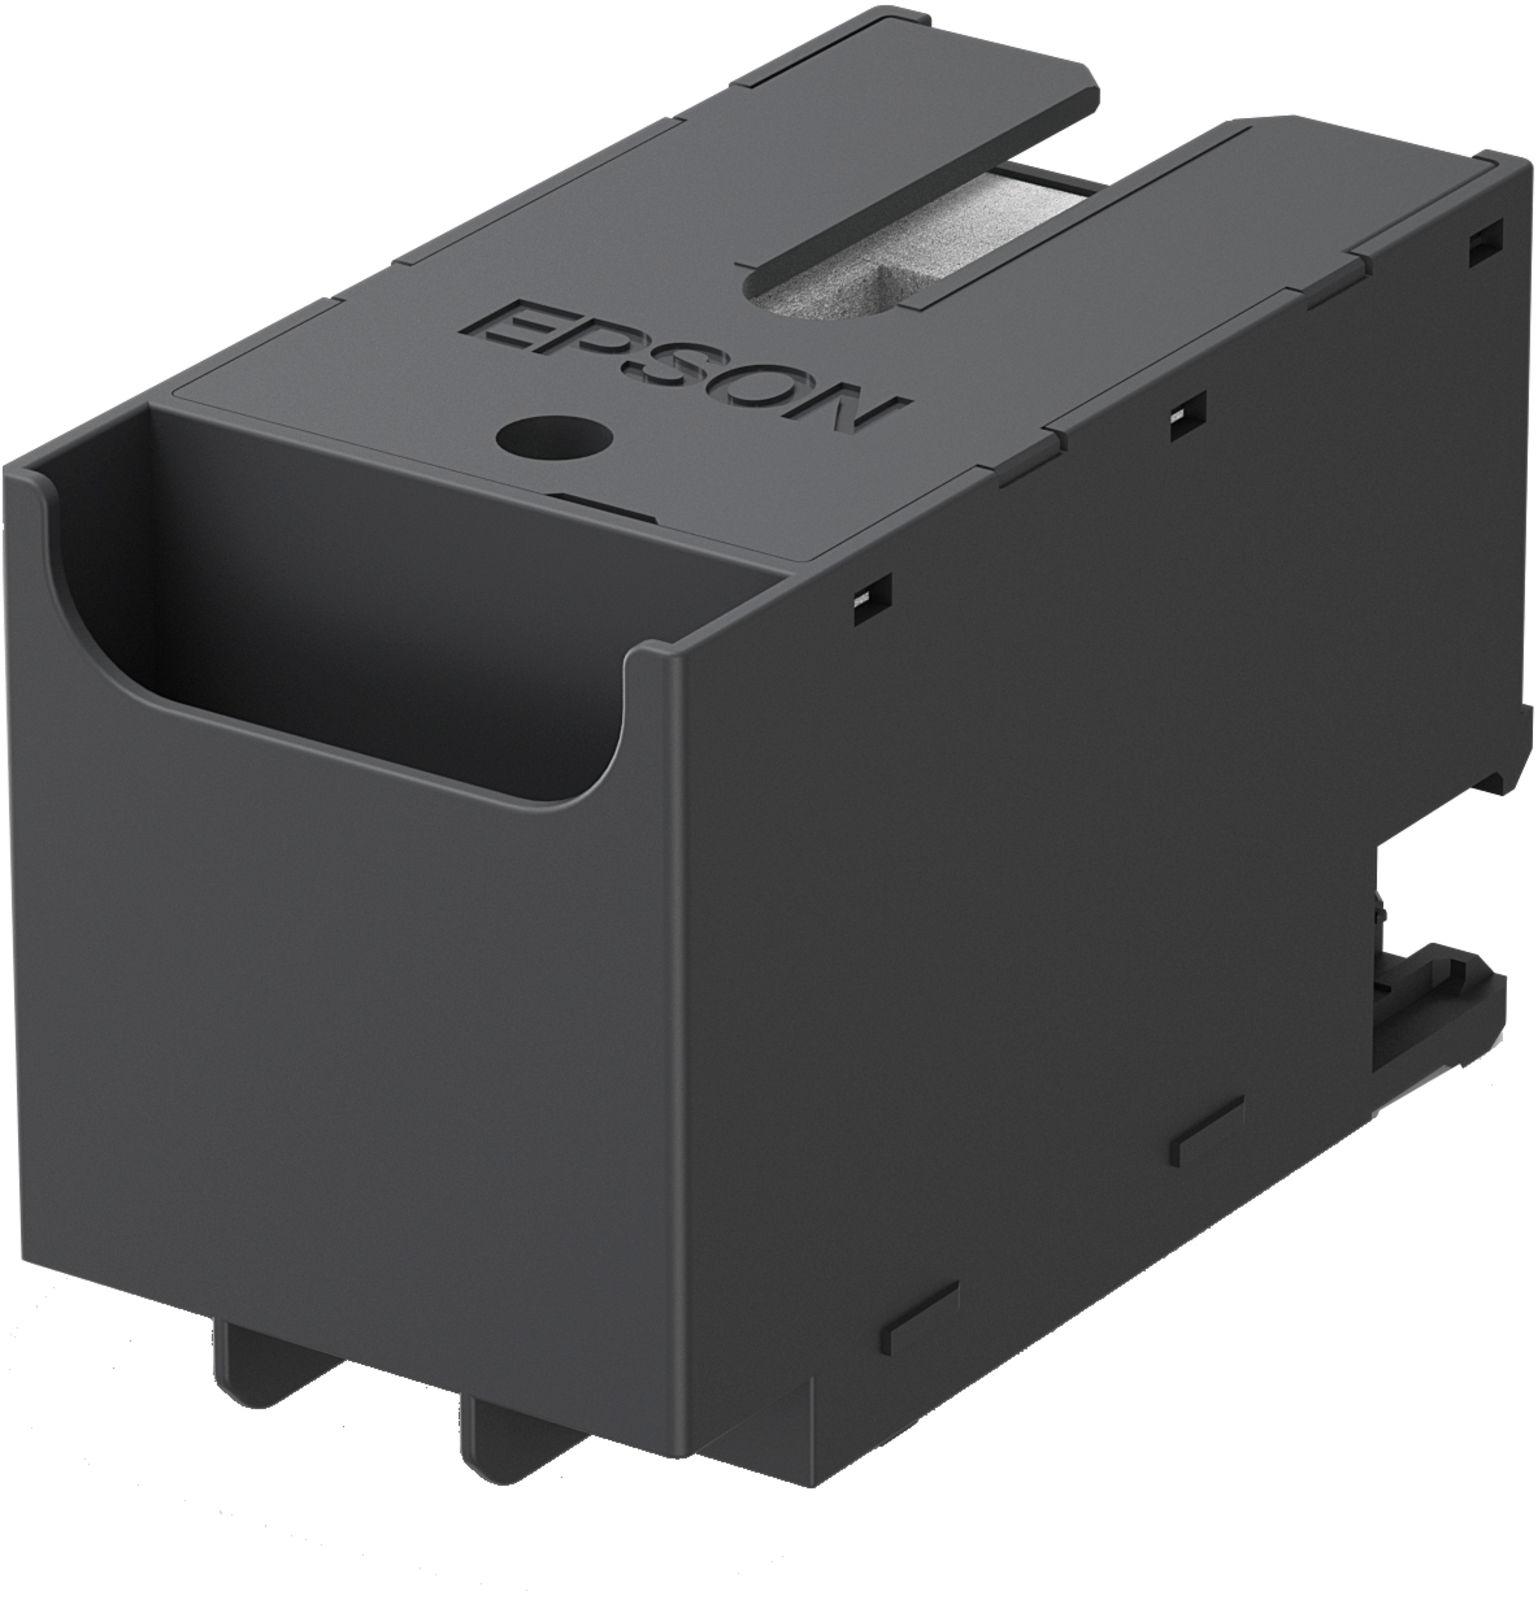 Epson Maintenance Box WorkForce Pro WF-4700 Series C13T671500 - eet01